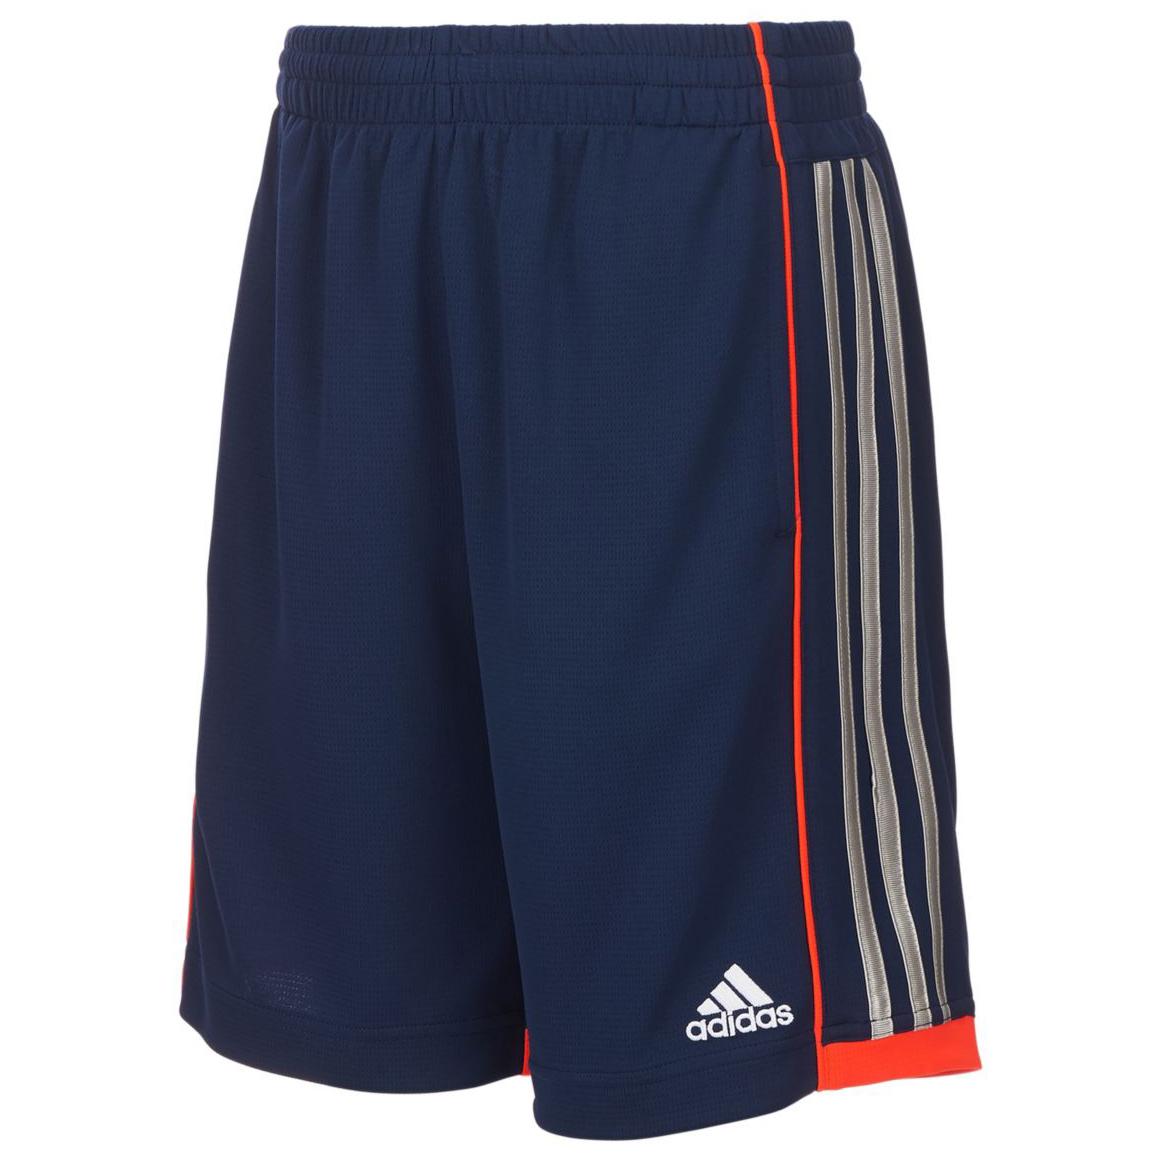 Adidas Little Boys' Next Speed Shorts - Blue, 6